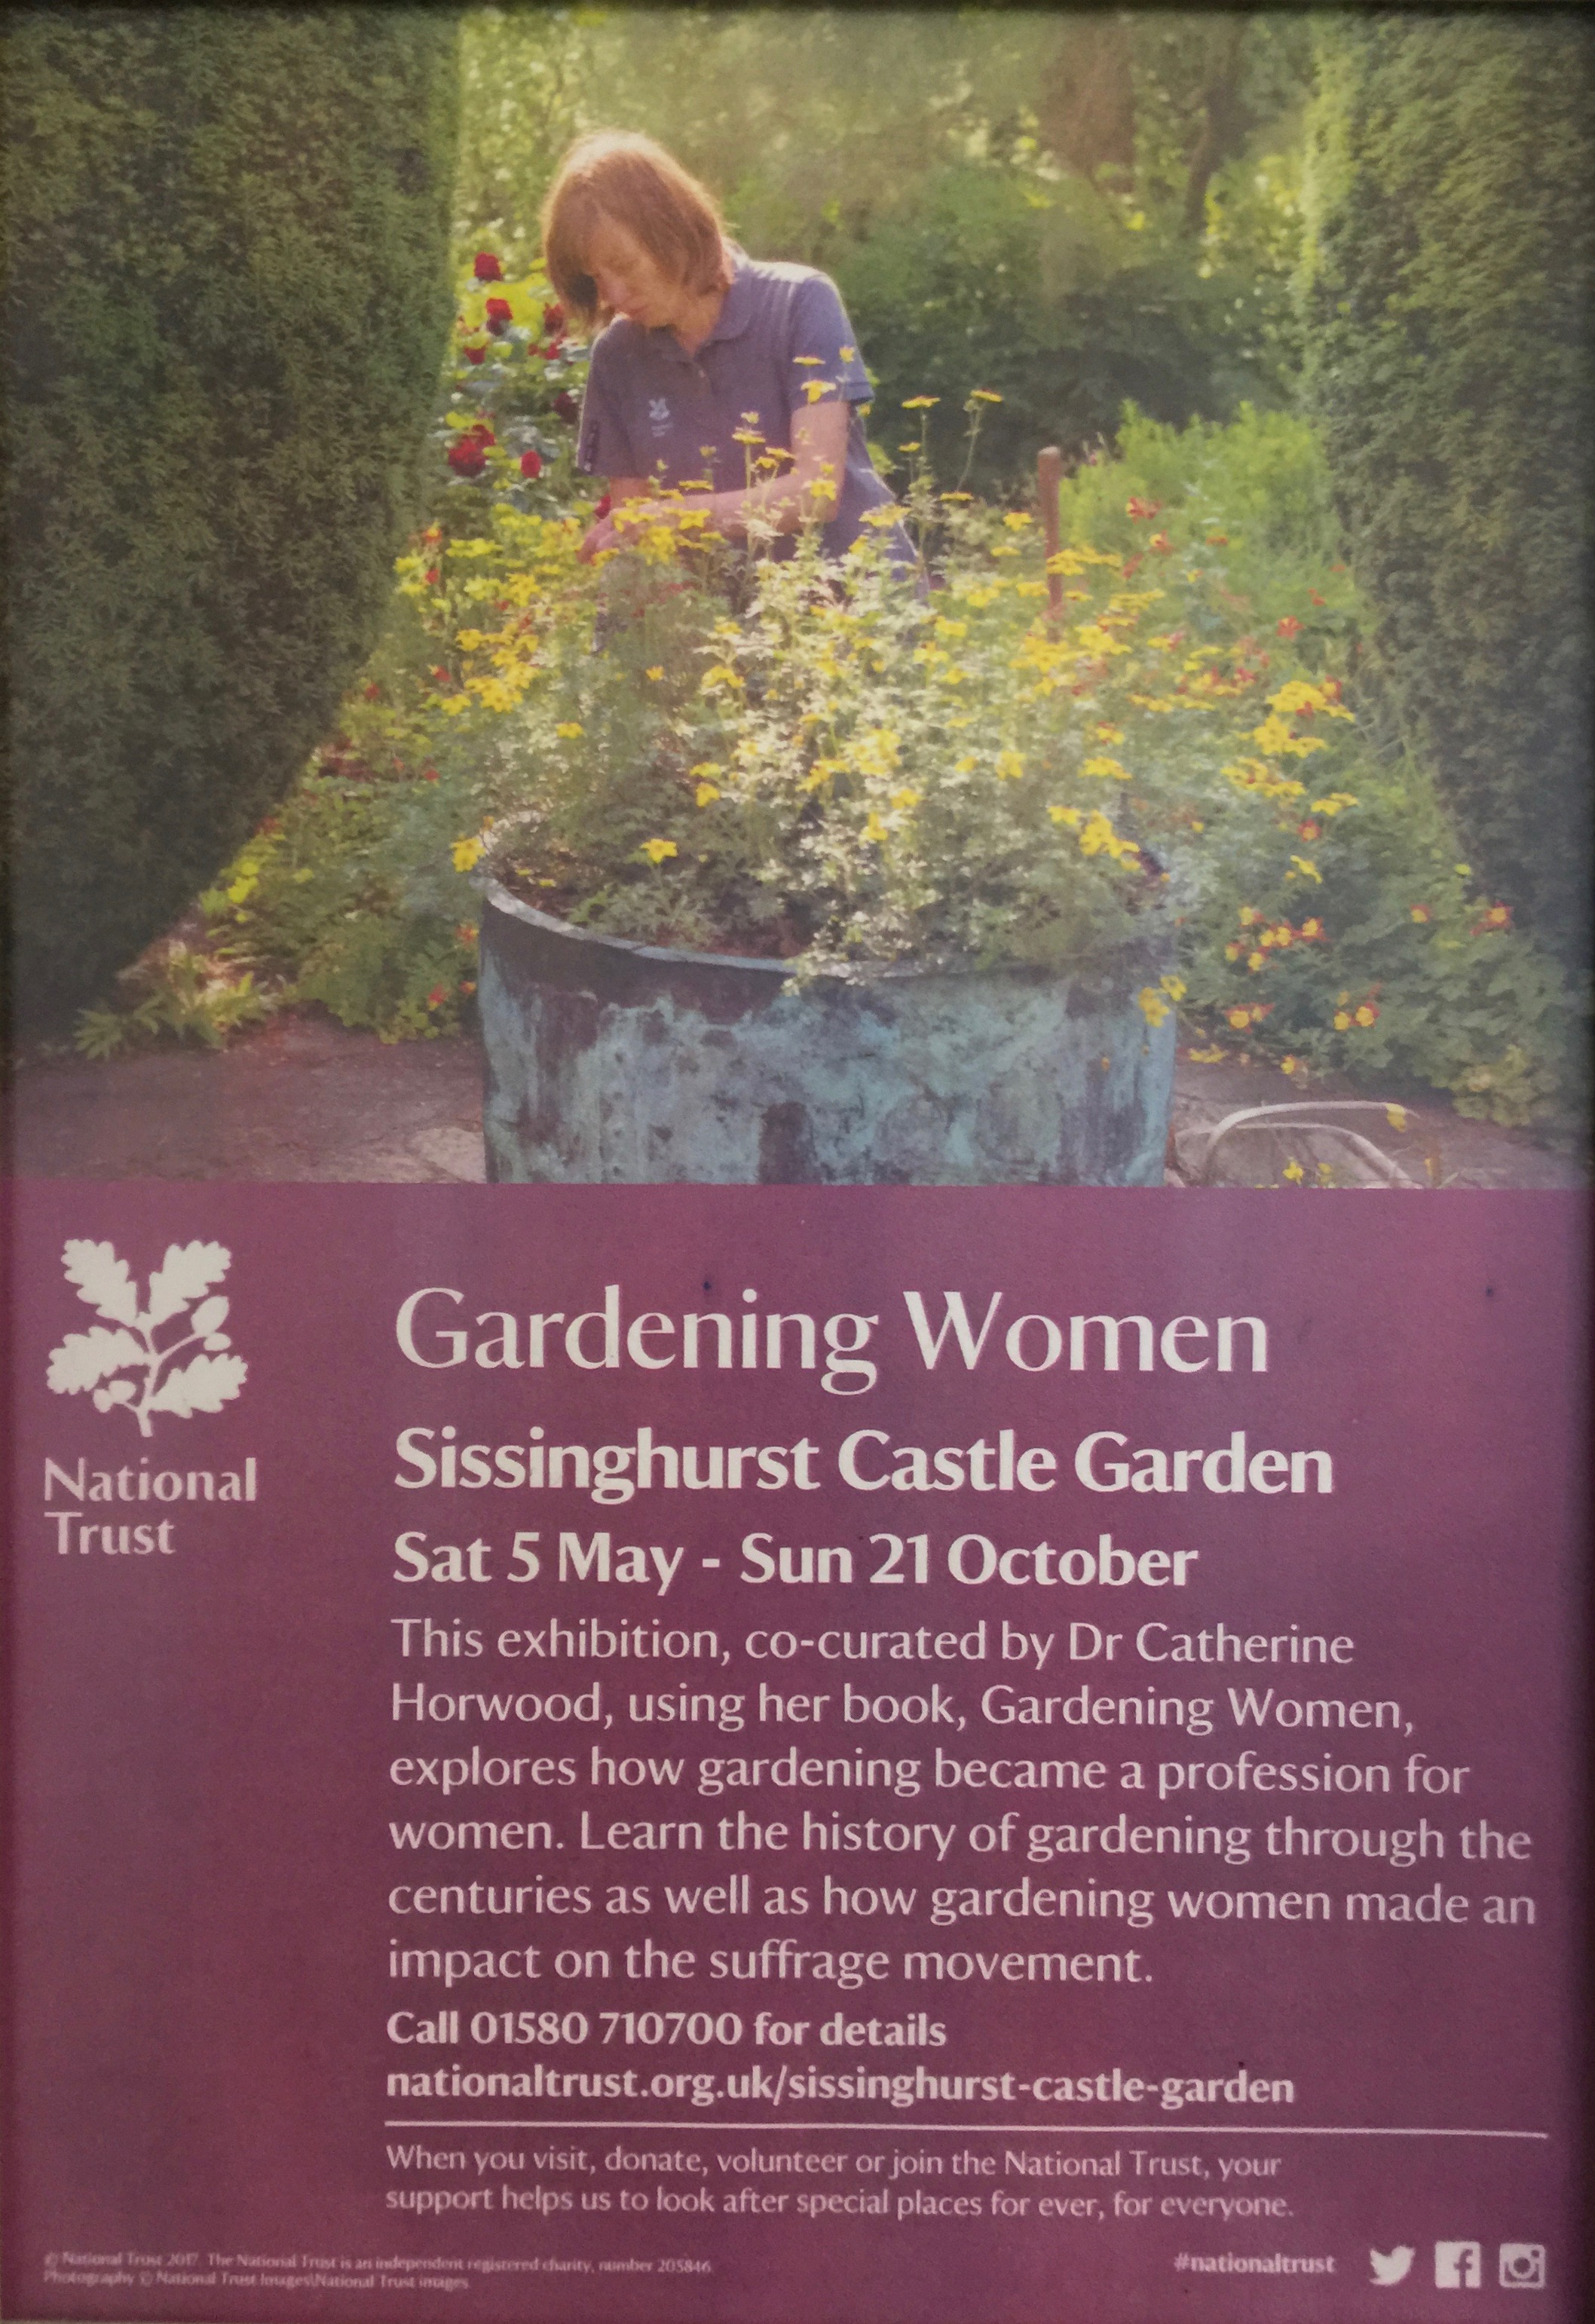 National Trust Gardening Women